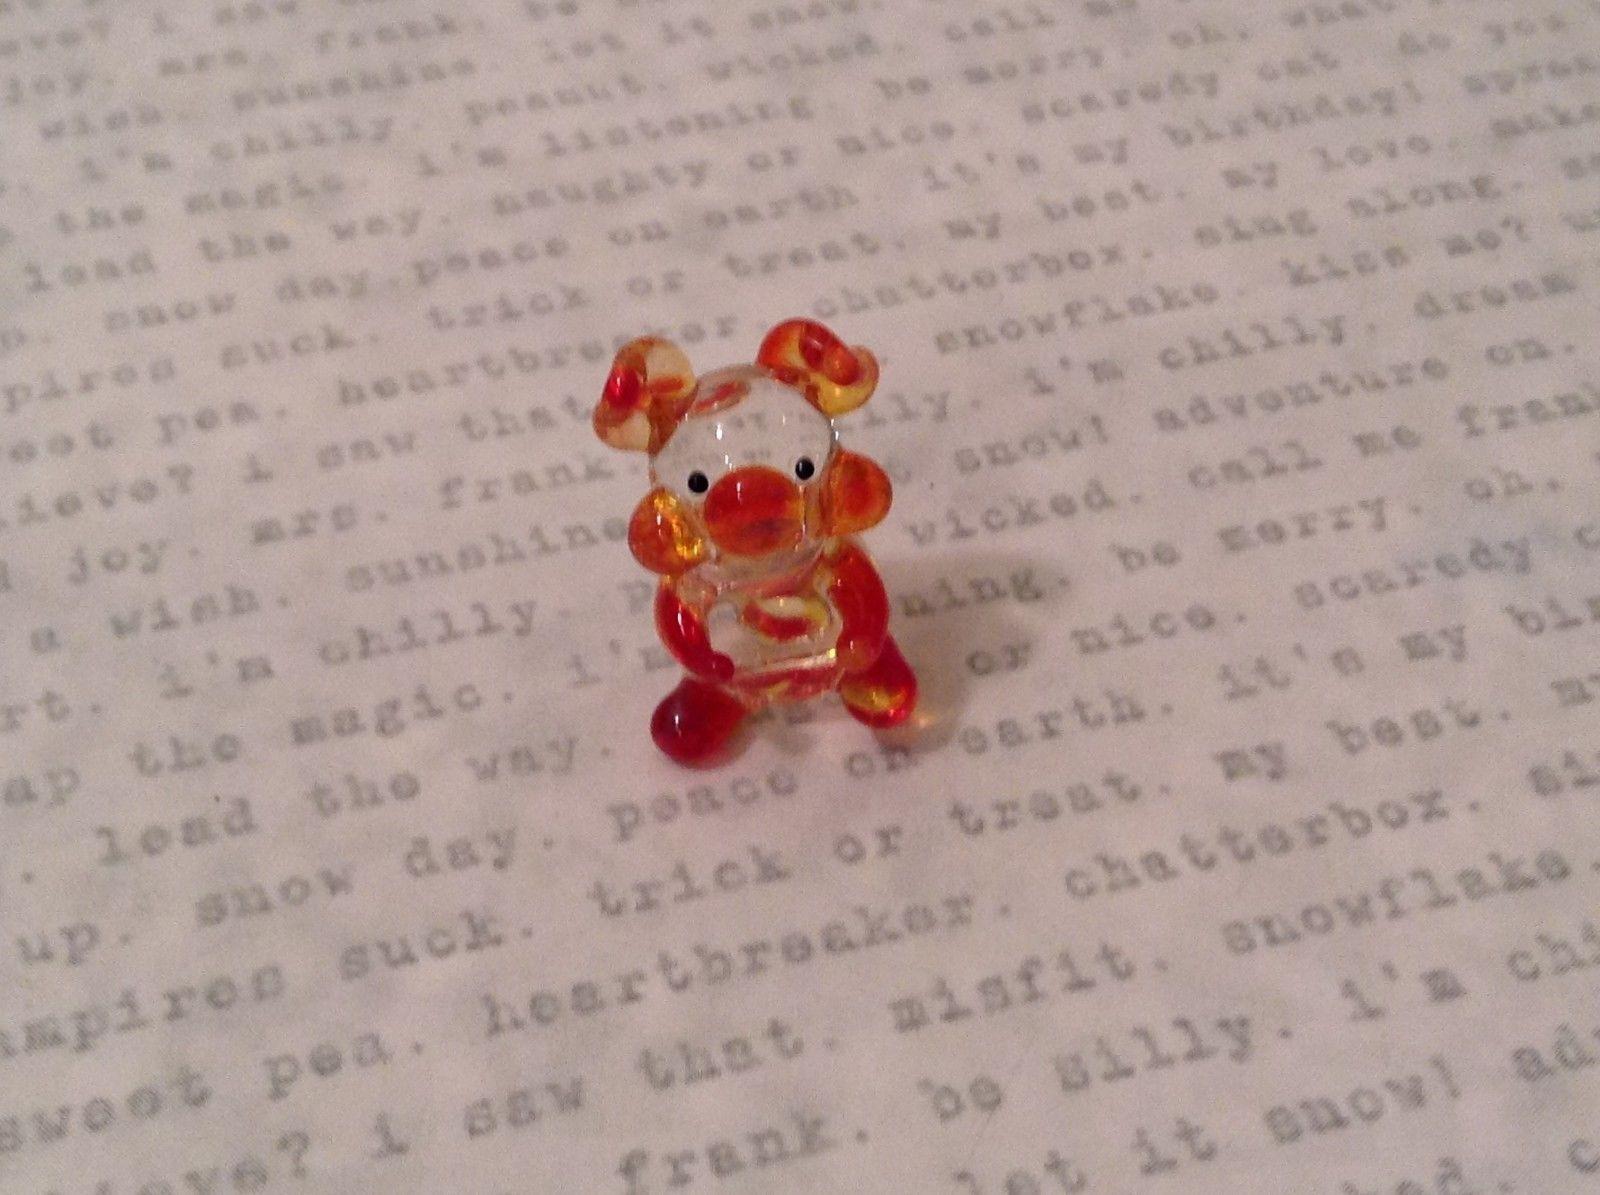 Micro miniature hand blown glass figurine  USA NIB clear pig w color accents